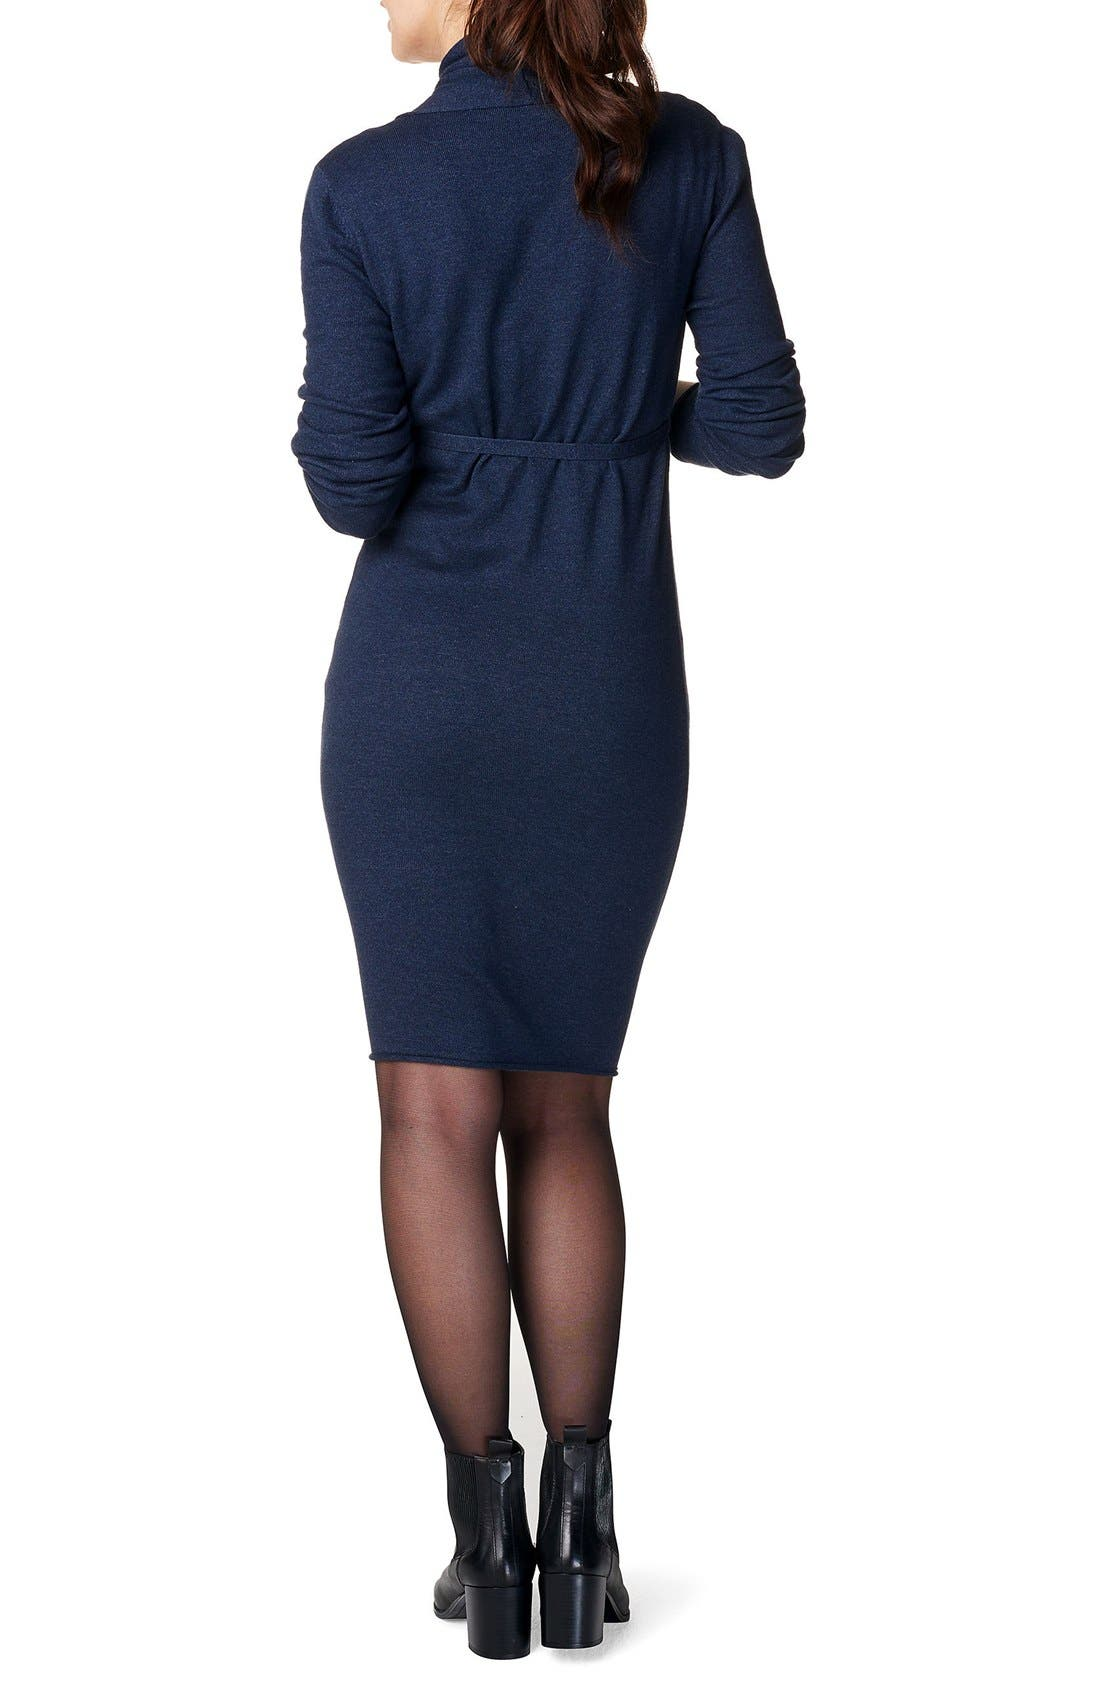 NOPPIES,                             Zara Knit Maternity Sweater Dress,                             Alternate thumbnail 2, color,                             410